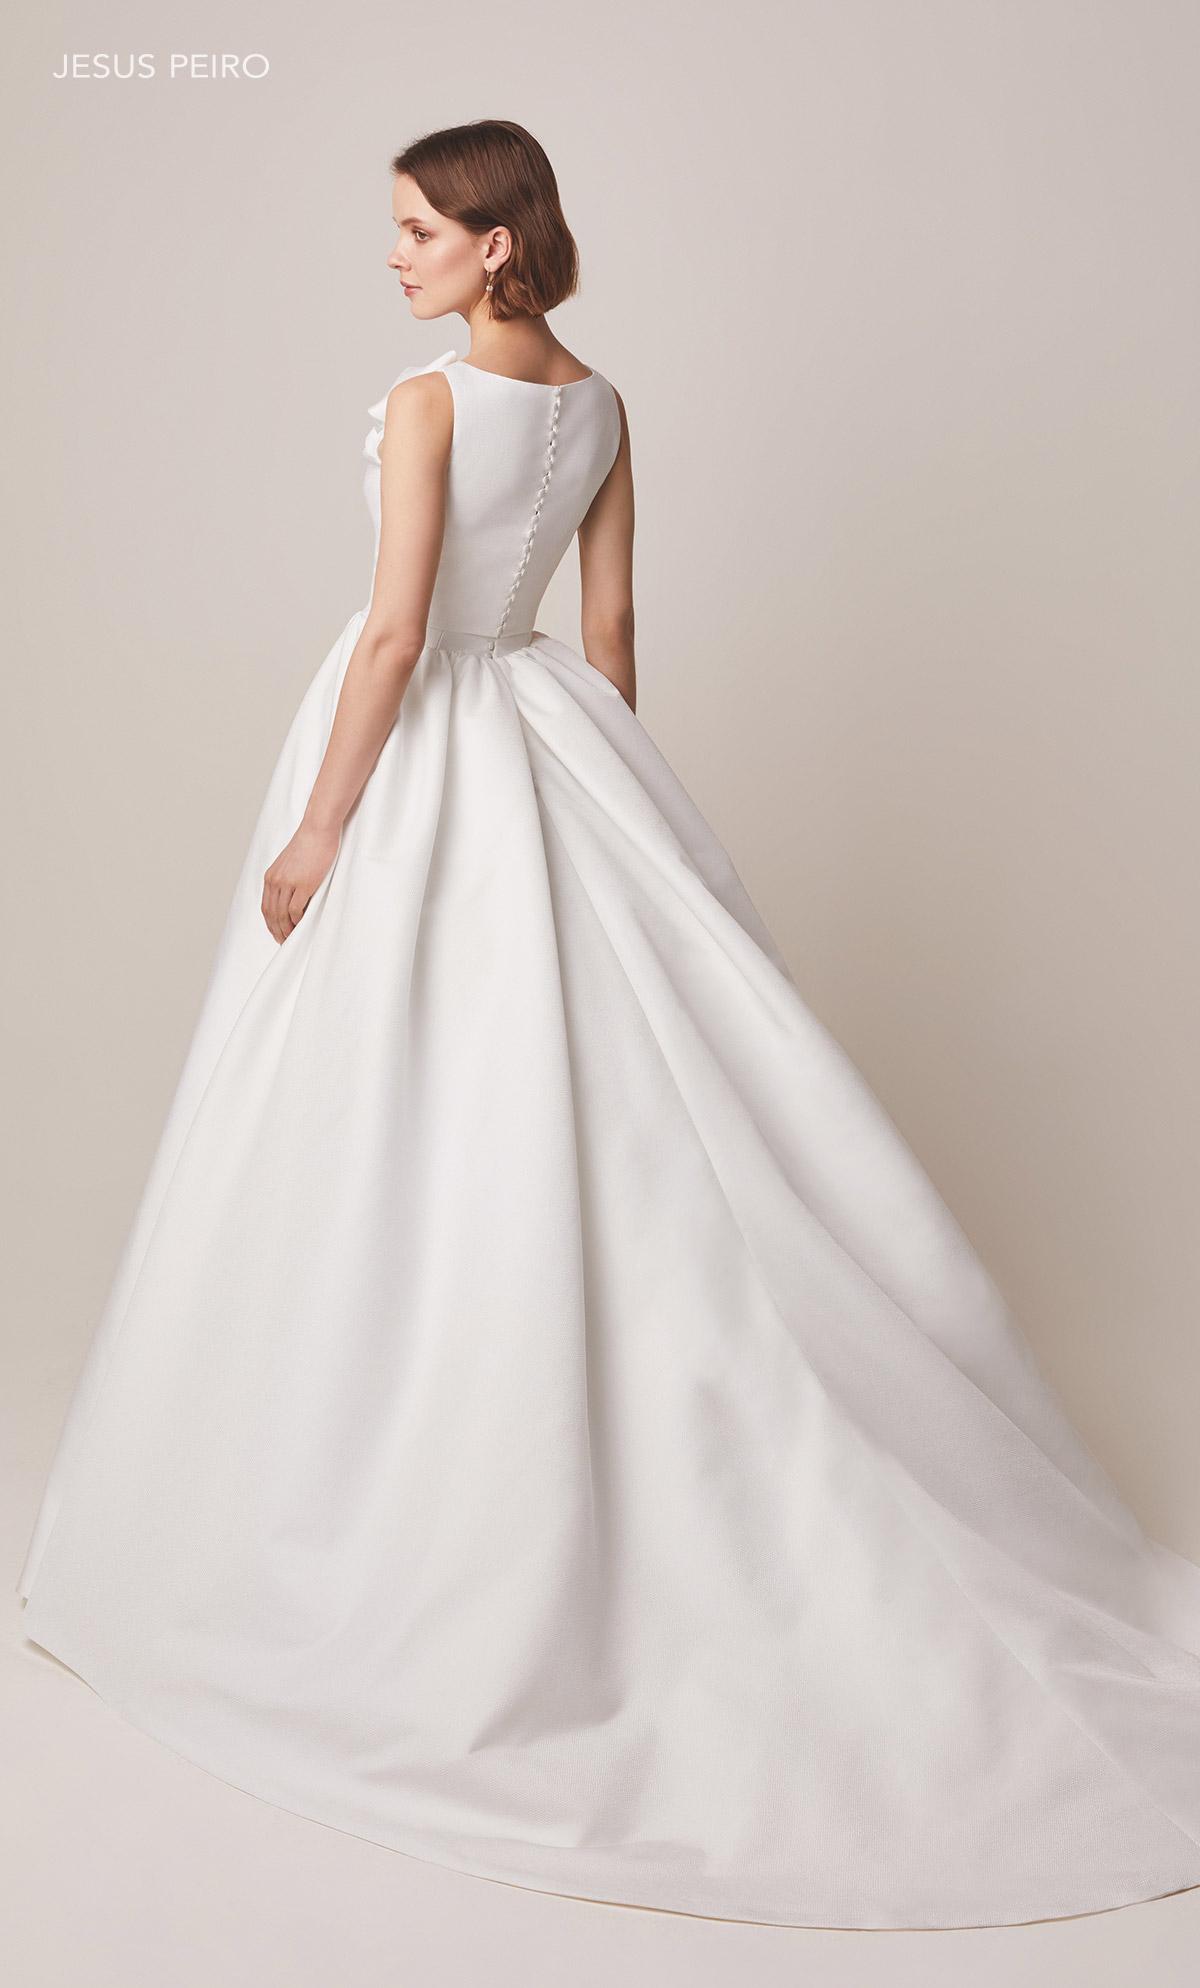 Vestido novia Jesús Peiró Ref.118